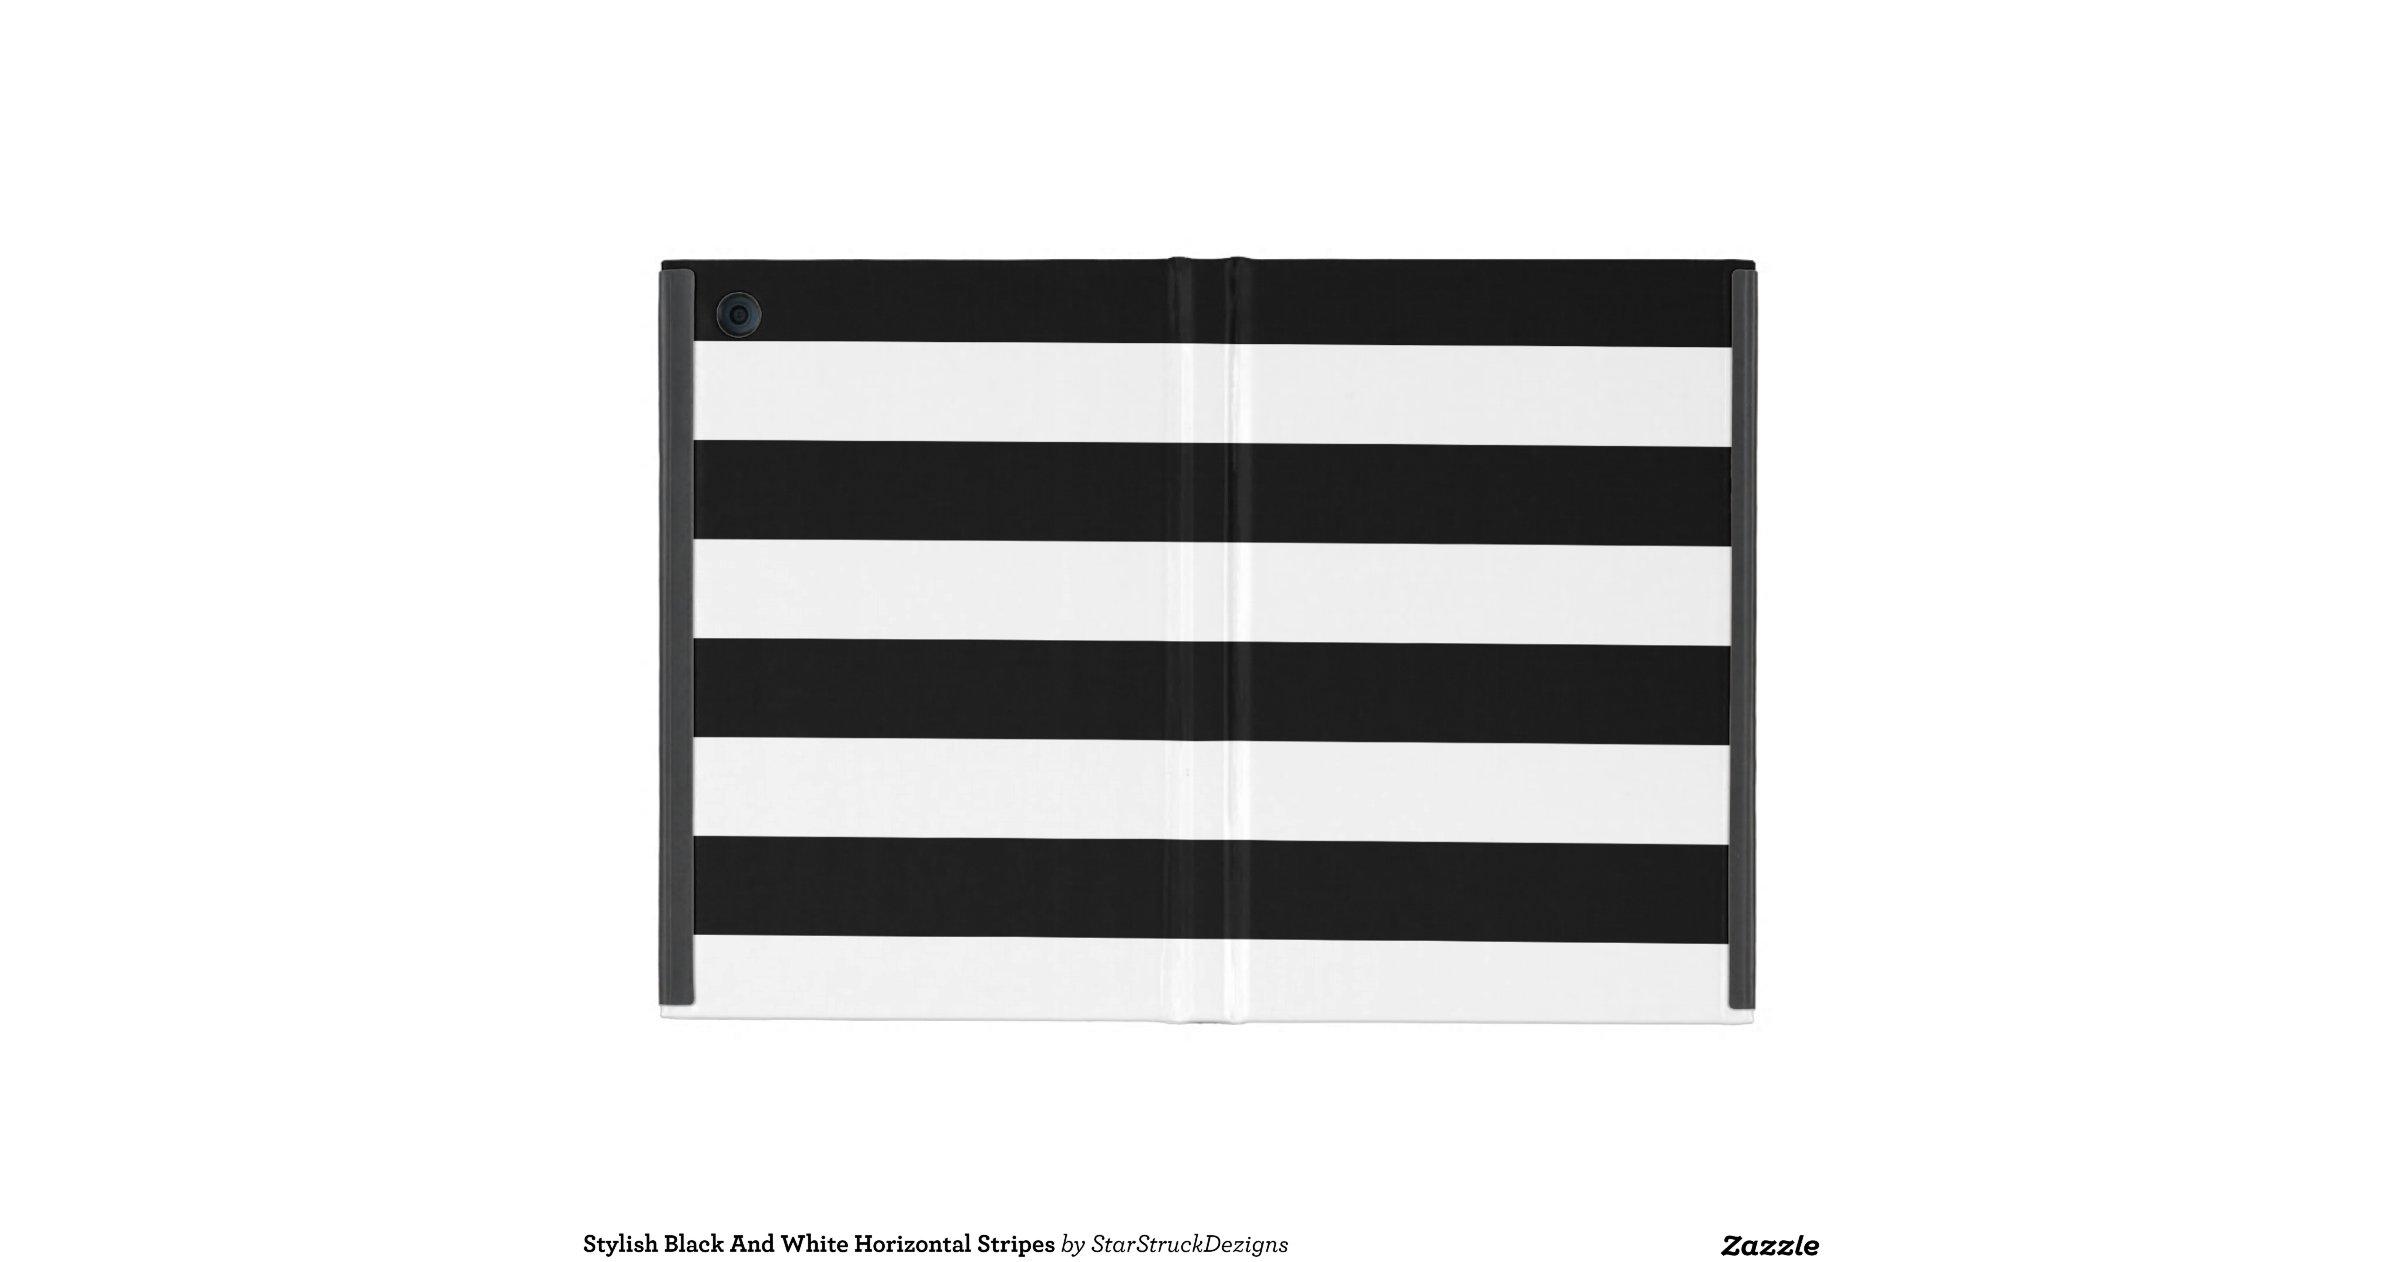 White Ipad Horizontal Female Hands With Mini 4 Luxury Kakusiga Carbon Fiber Smart Flip Cover Atau Case Download Stylish Black And Stripes For